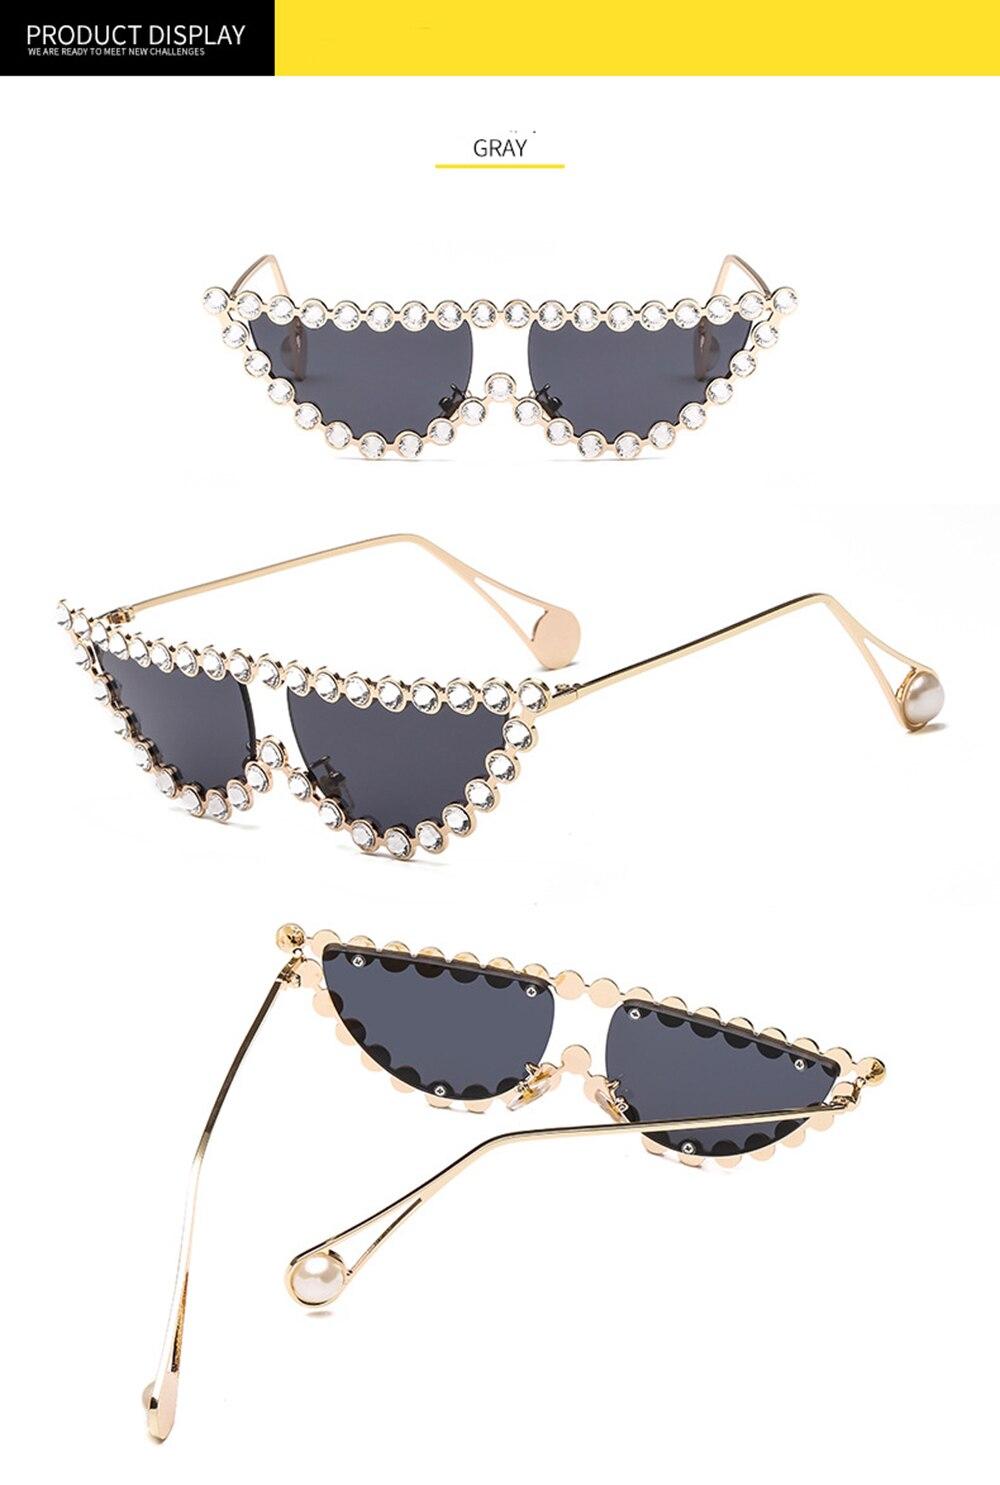 SOL DE ORO Cat Eye Sunglasses Shades for Women Luxury Sunglasses UV400 Protection Polycarbonate Lens Alloy Frame Sunglasses in Women 39 s Sunglasses from Apparel Accessories